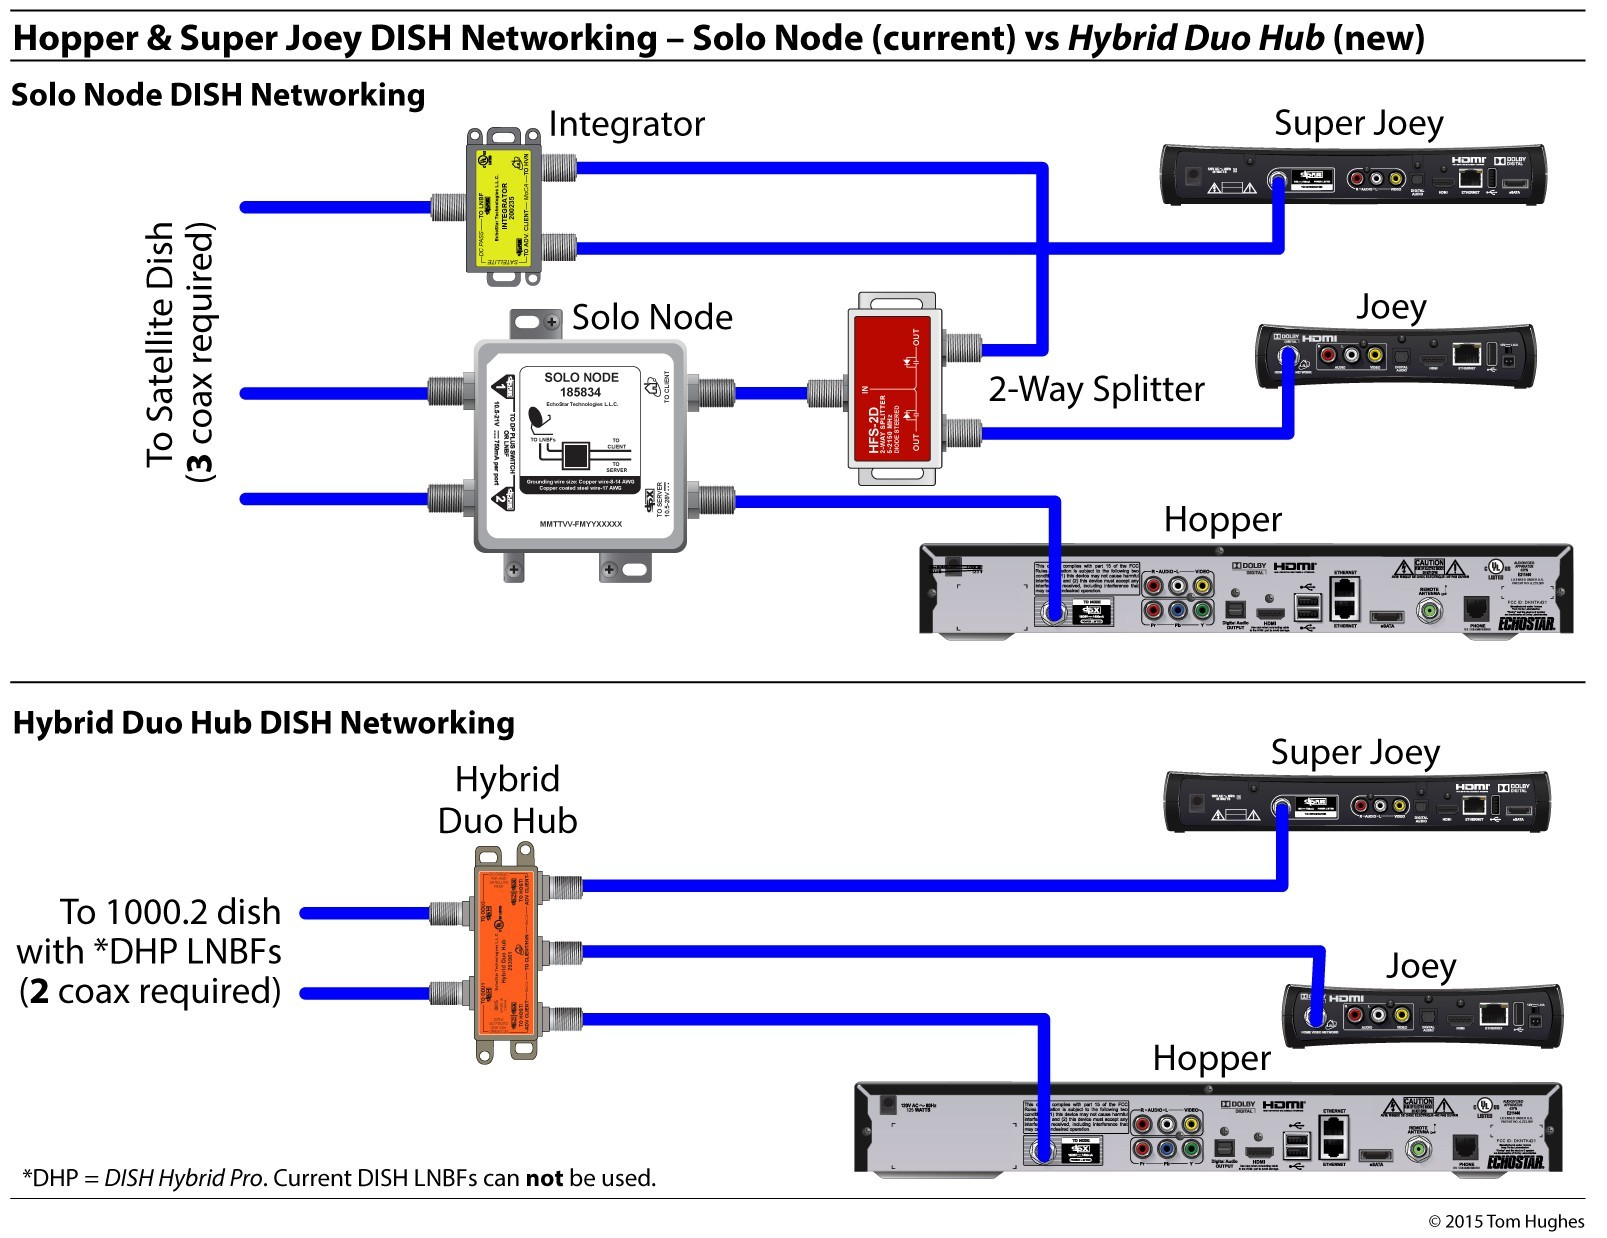 Hook Up Network Wiring Diagram Beautiful Dish Network 722 Wiring Diagram  Wiring Diagram